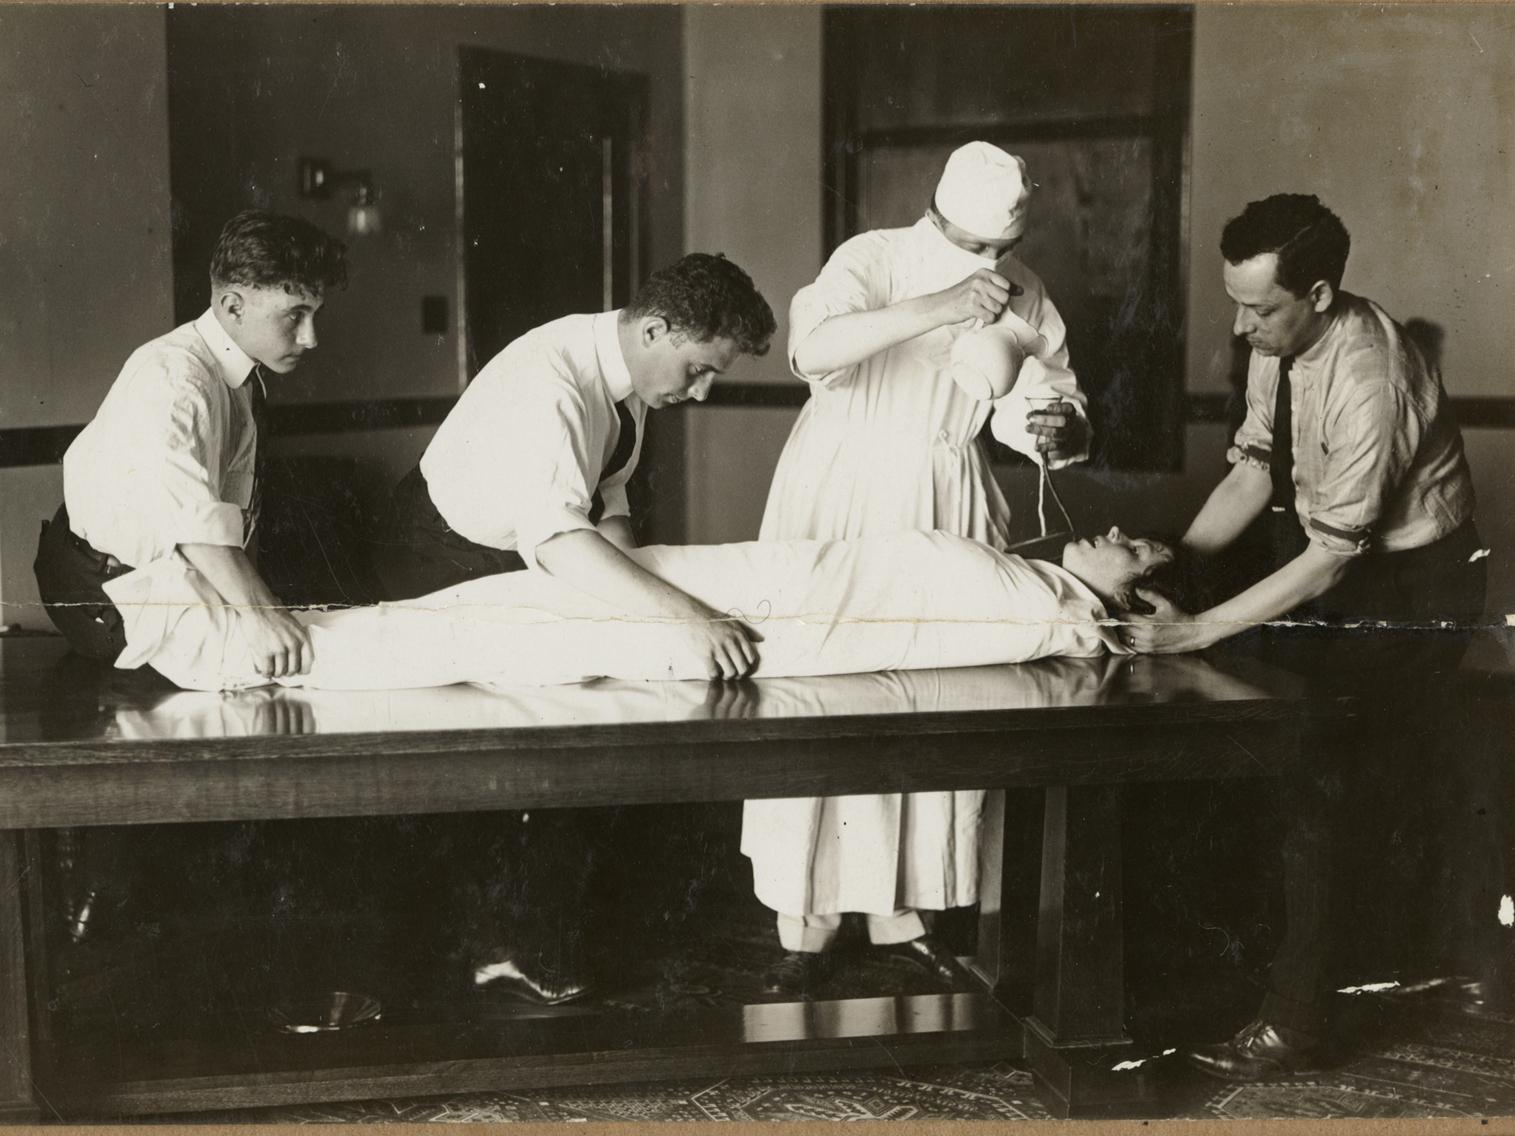 Stunt journalism: writer Djuna Barnes voluntarily being force-fed to understand the experiences of imprisoned suffragettes